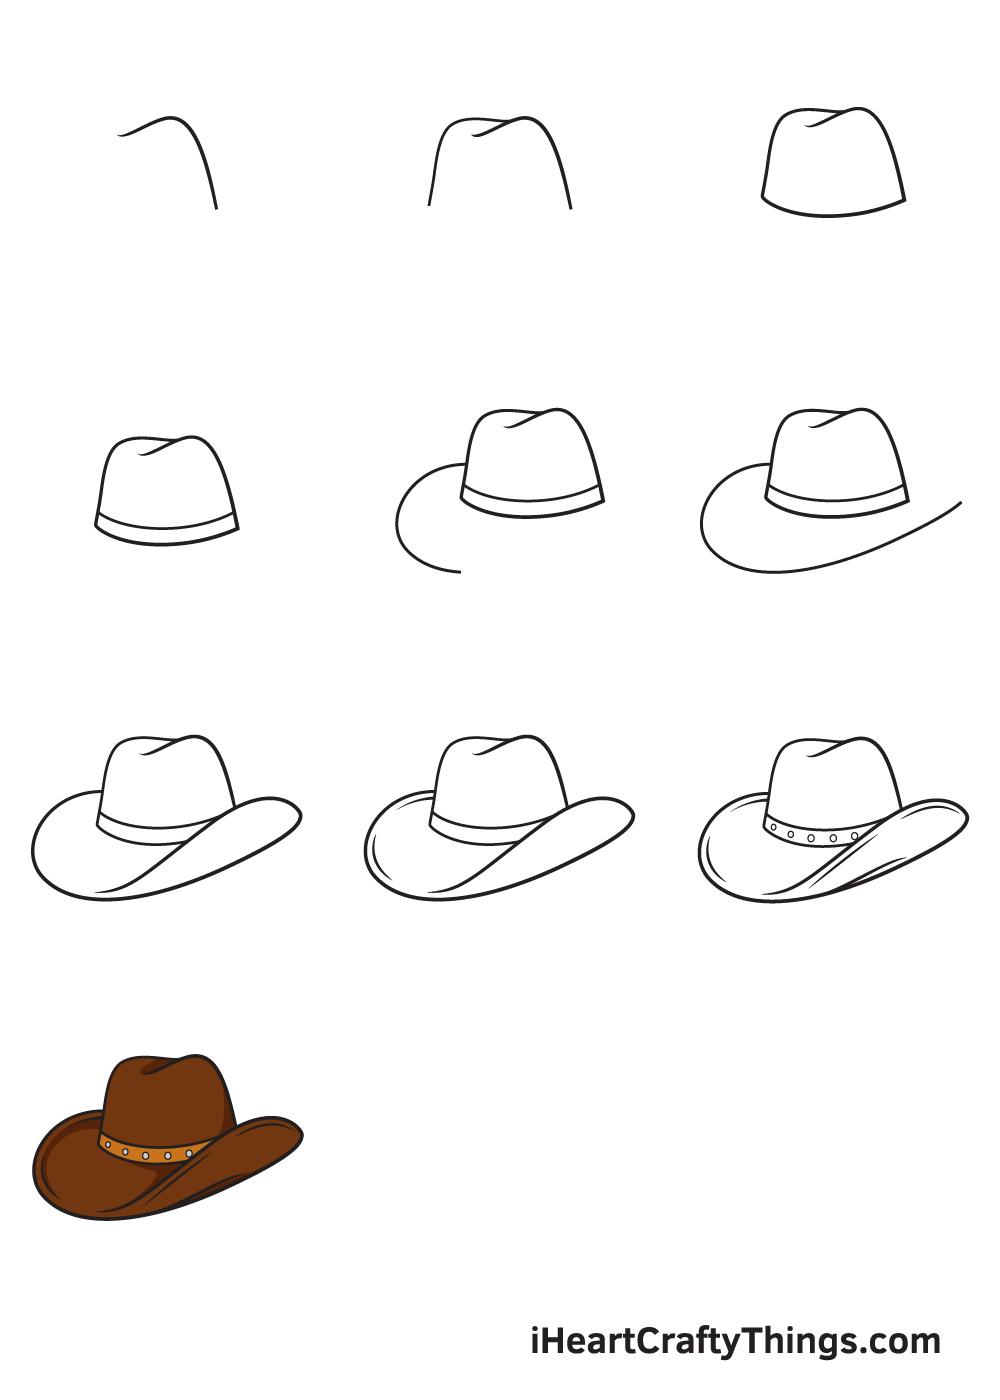 drawing cowboy hat in 9 easy steps